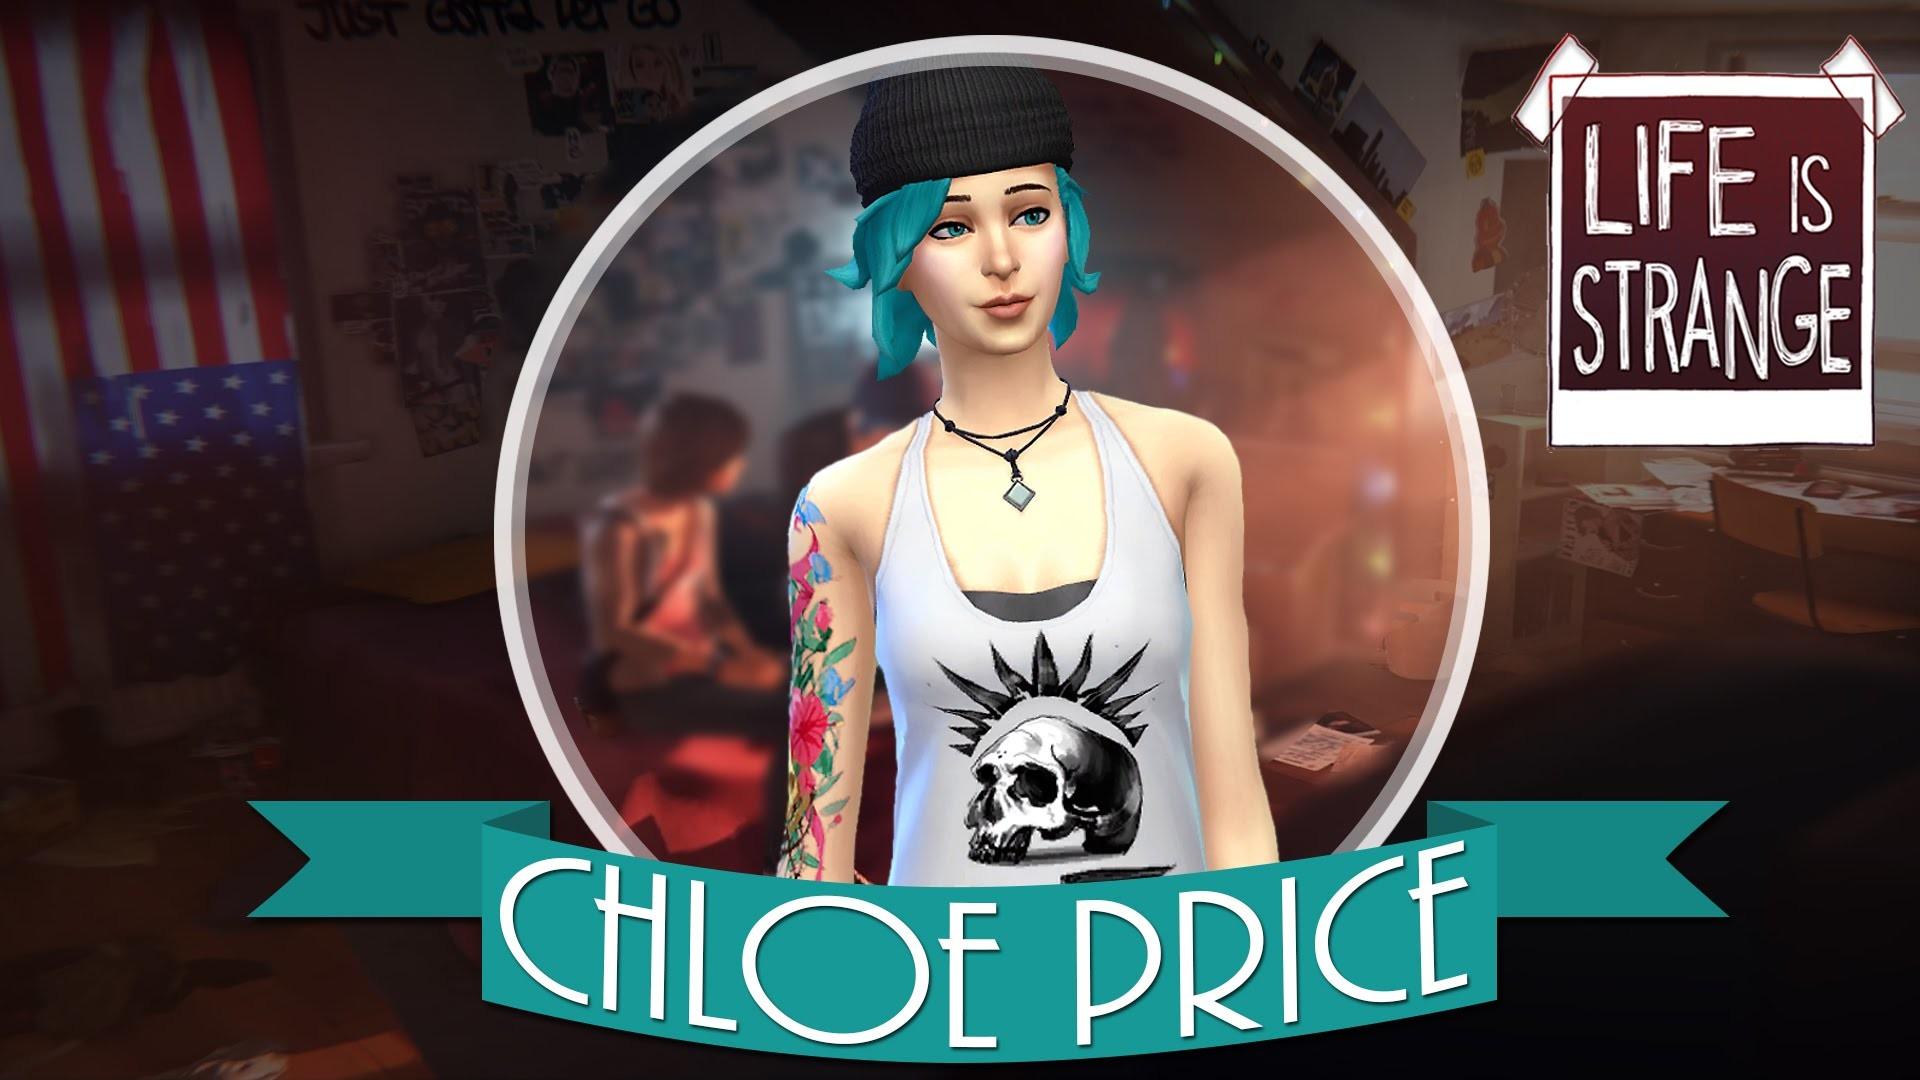 65220c7f907 1920x1080 General 1920x1080 Life Is Strange Max Caulfield Chloe Price  kissing